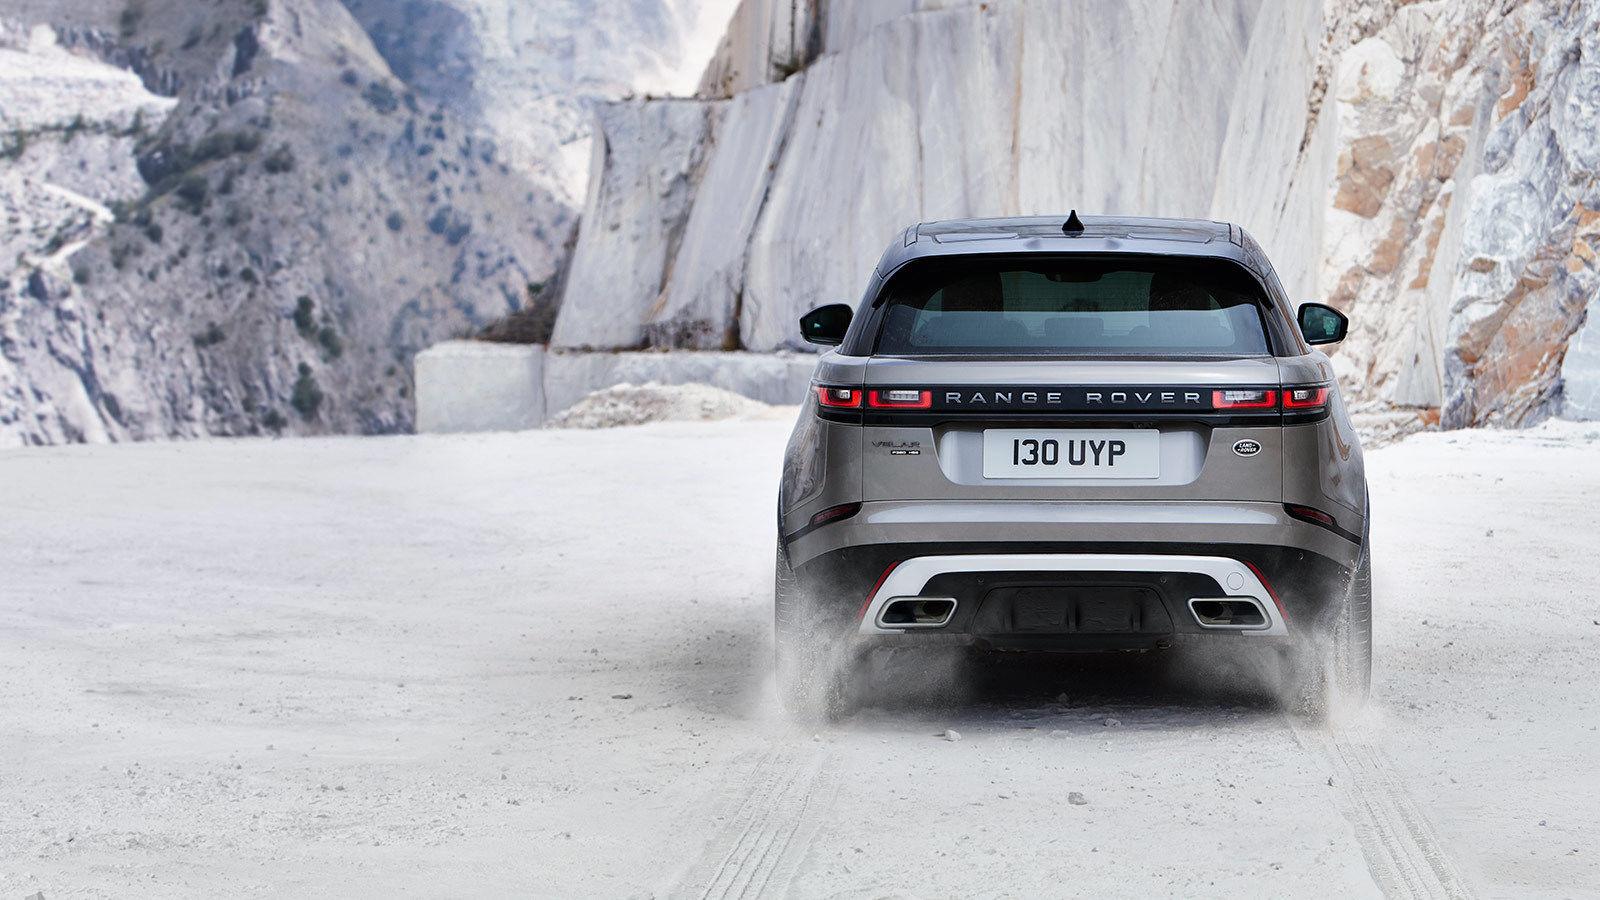 Range Rover Velar - Most Capable Medium SUV | Land Rover Tanzania